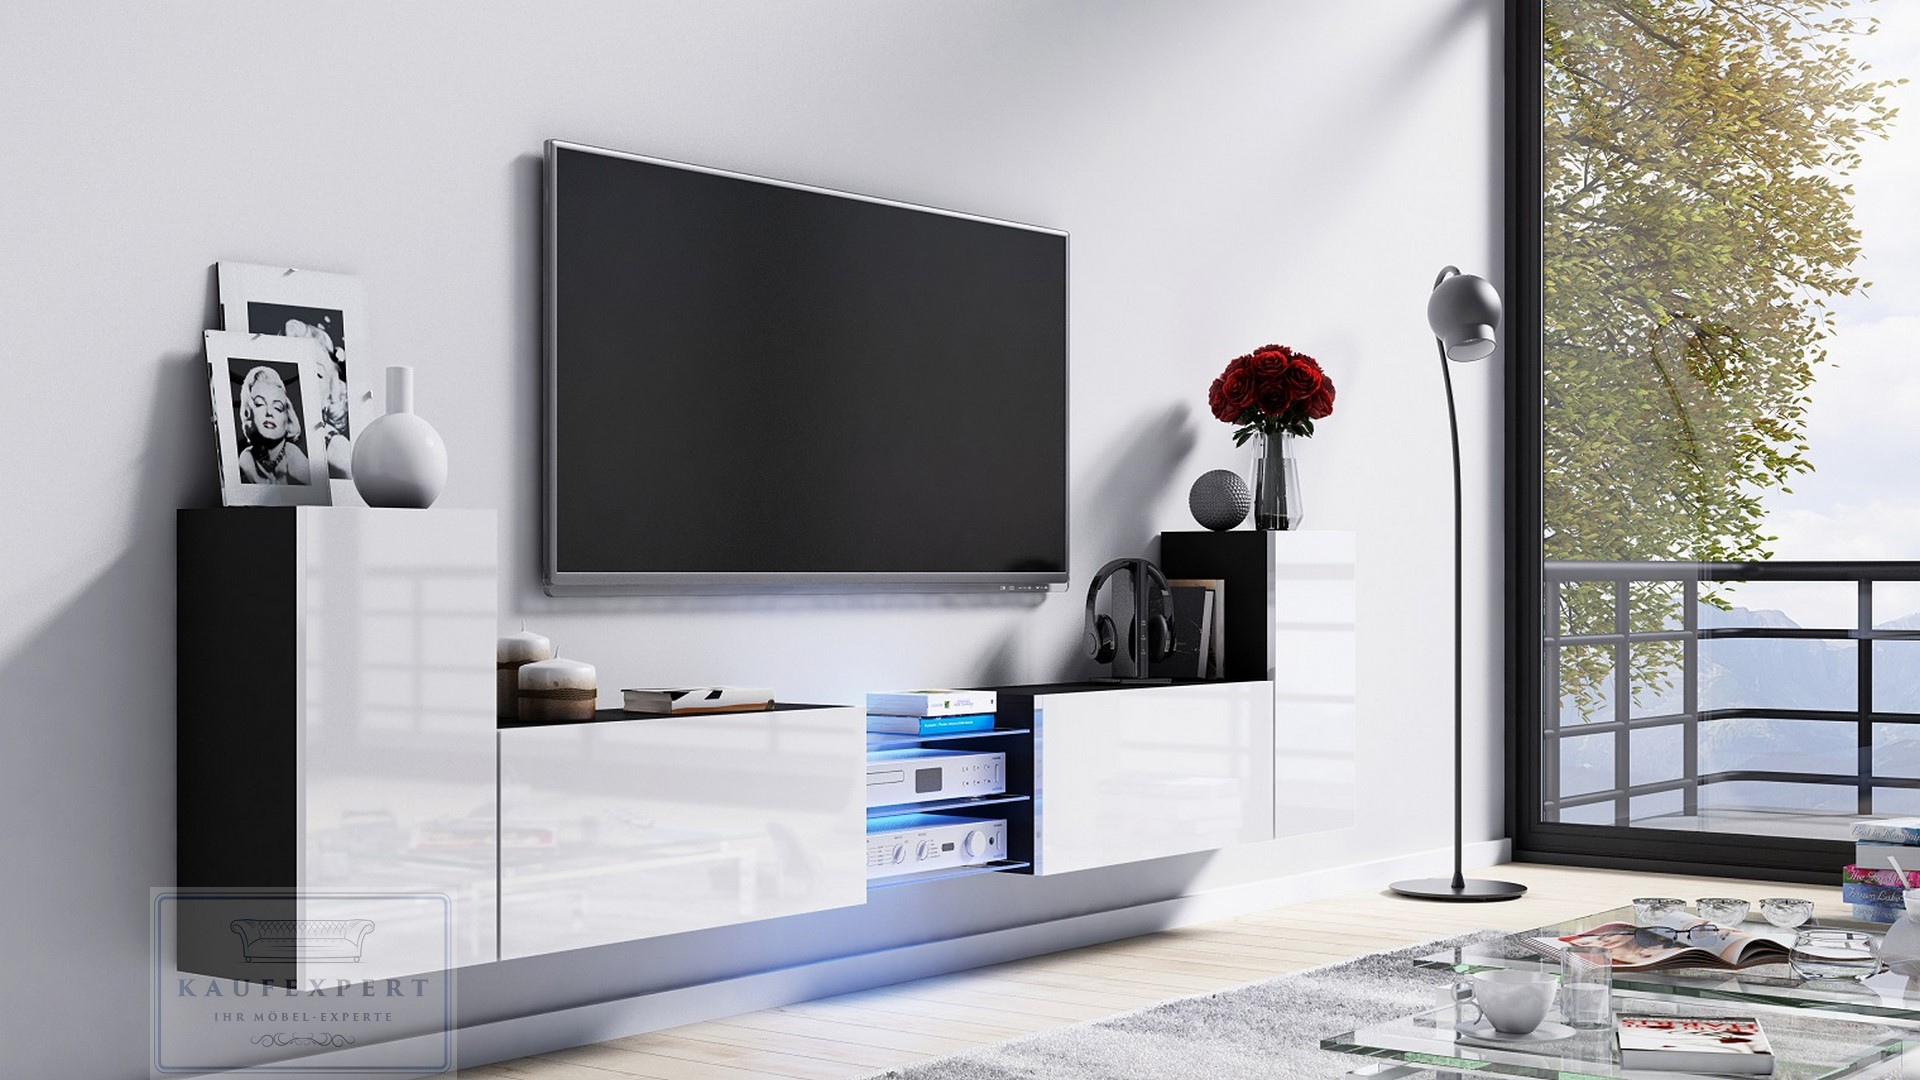 Kaufexpert Tv Lowboard Galaxy Weiss Hochglanz Schwarz Mdf Design